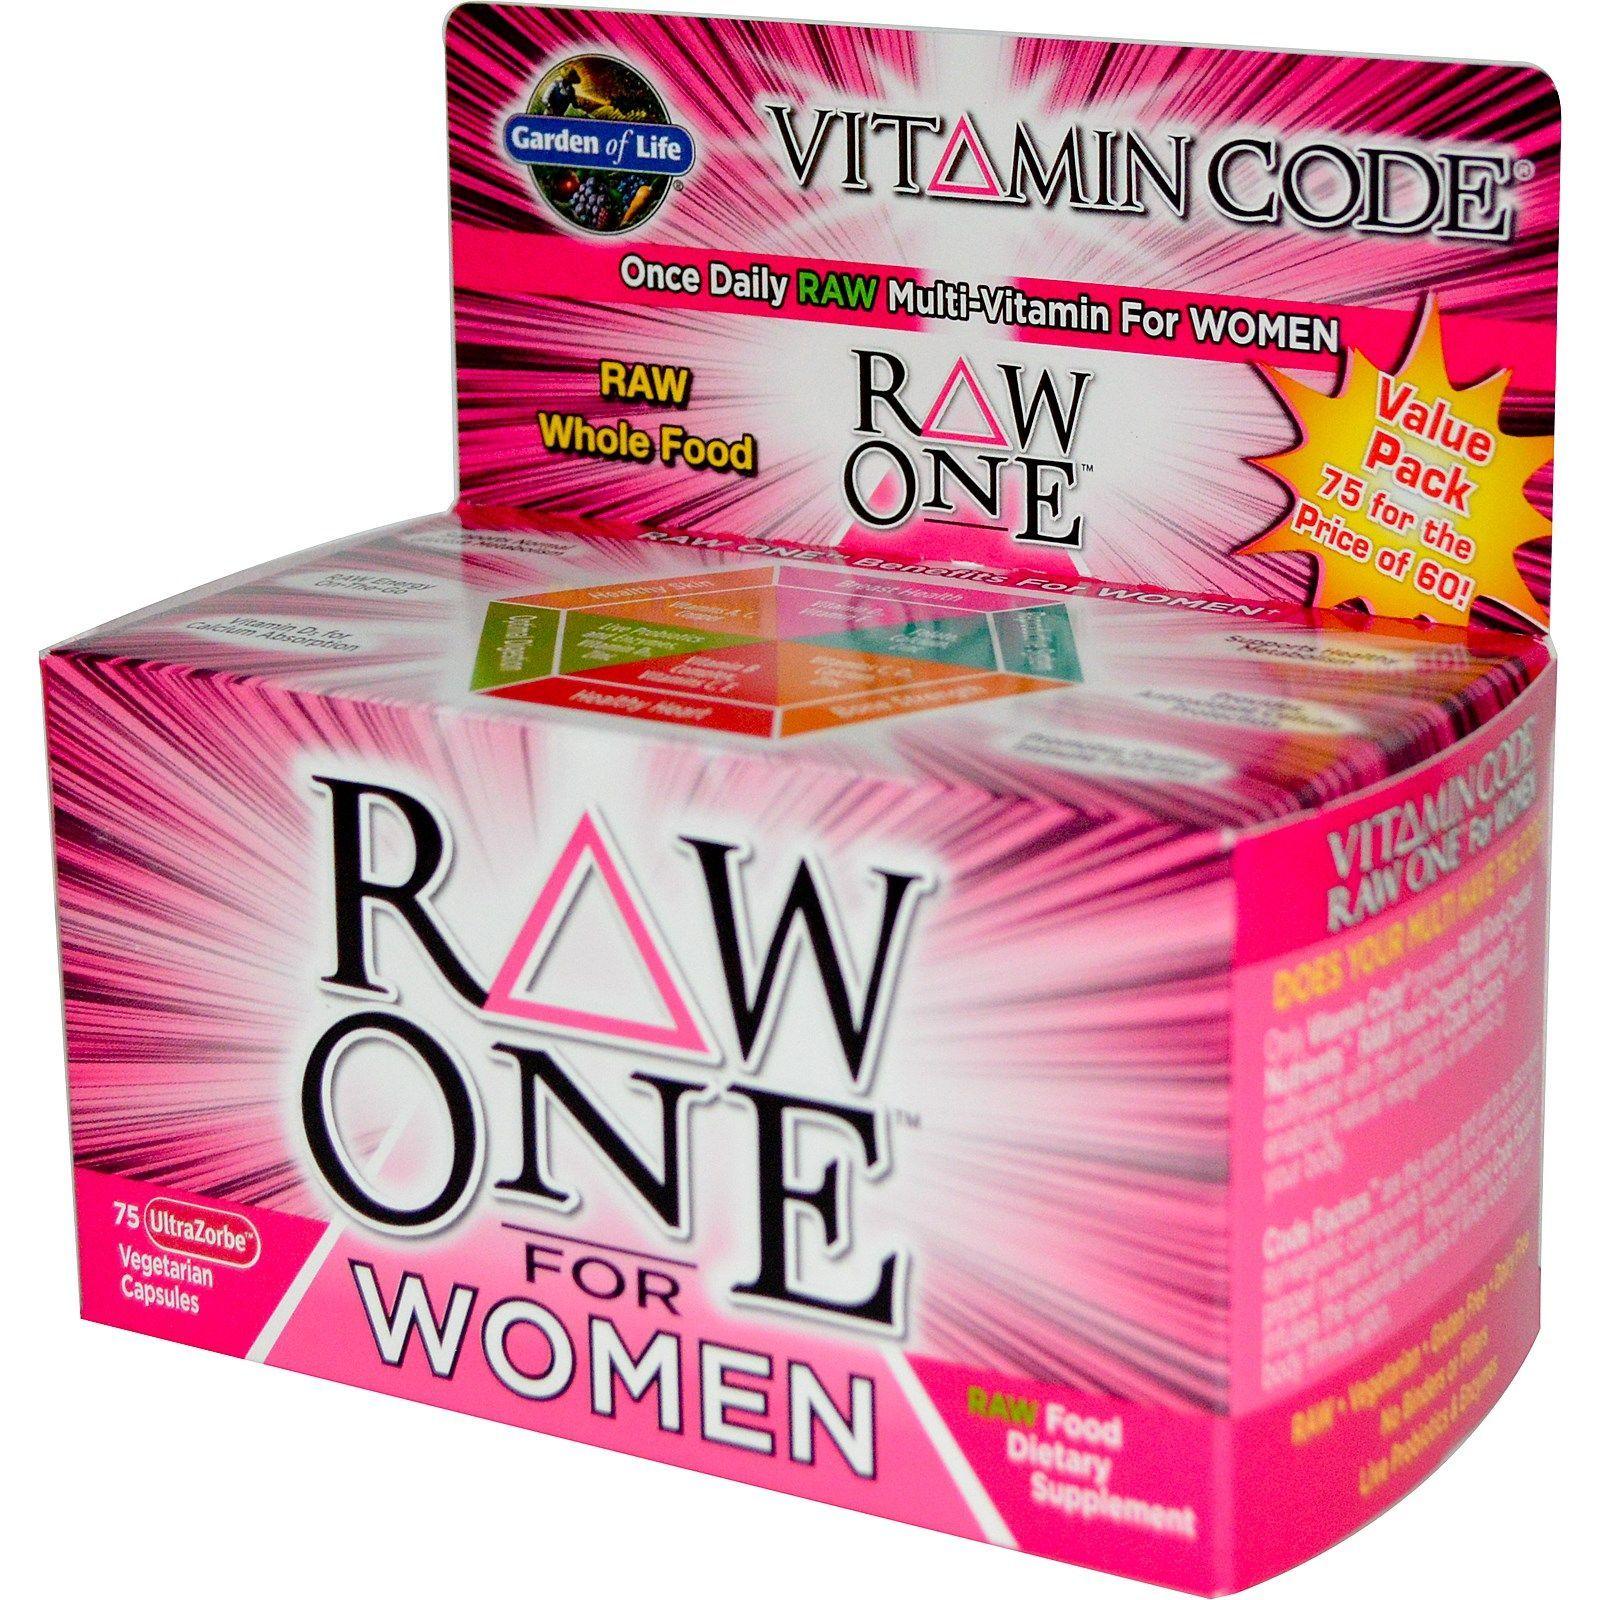 Garden Of Life Vitamin Code Raw One Once Daily Raw Multi Vitamin For Women 75 Ultrazorbe Veggie Caps Capsules Co In 2020 Vitamins For Women Vitamins Multivitamin